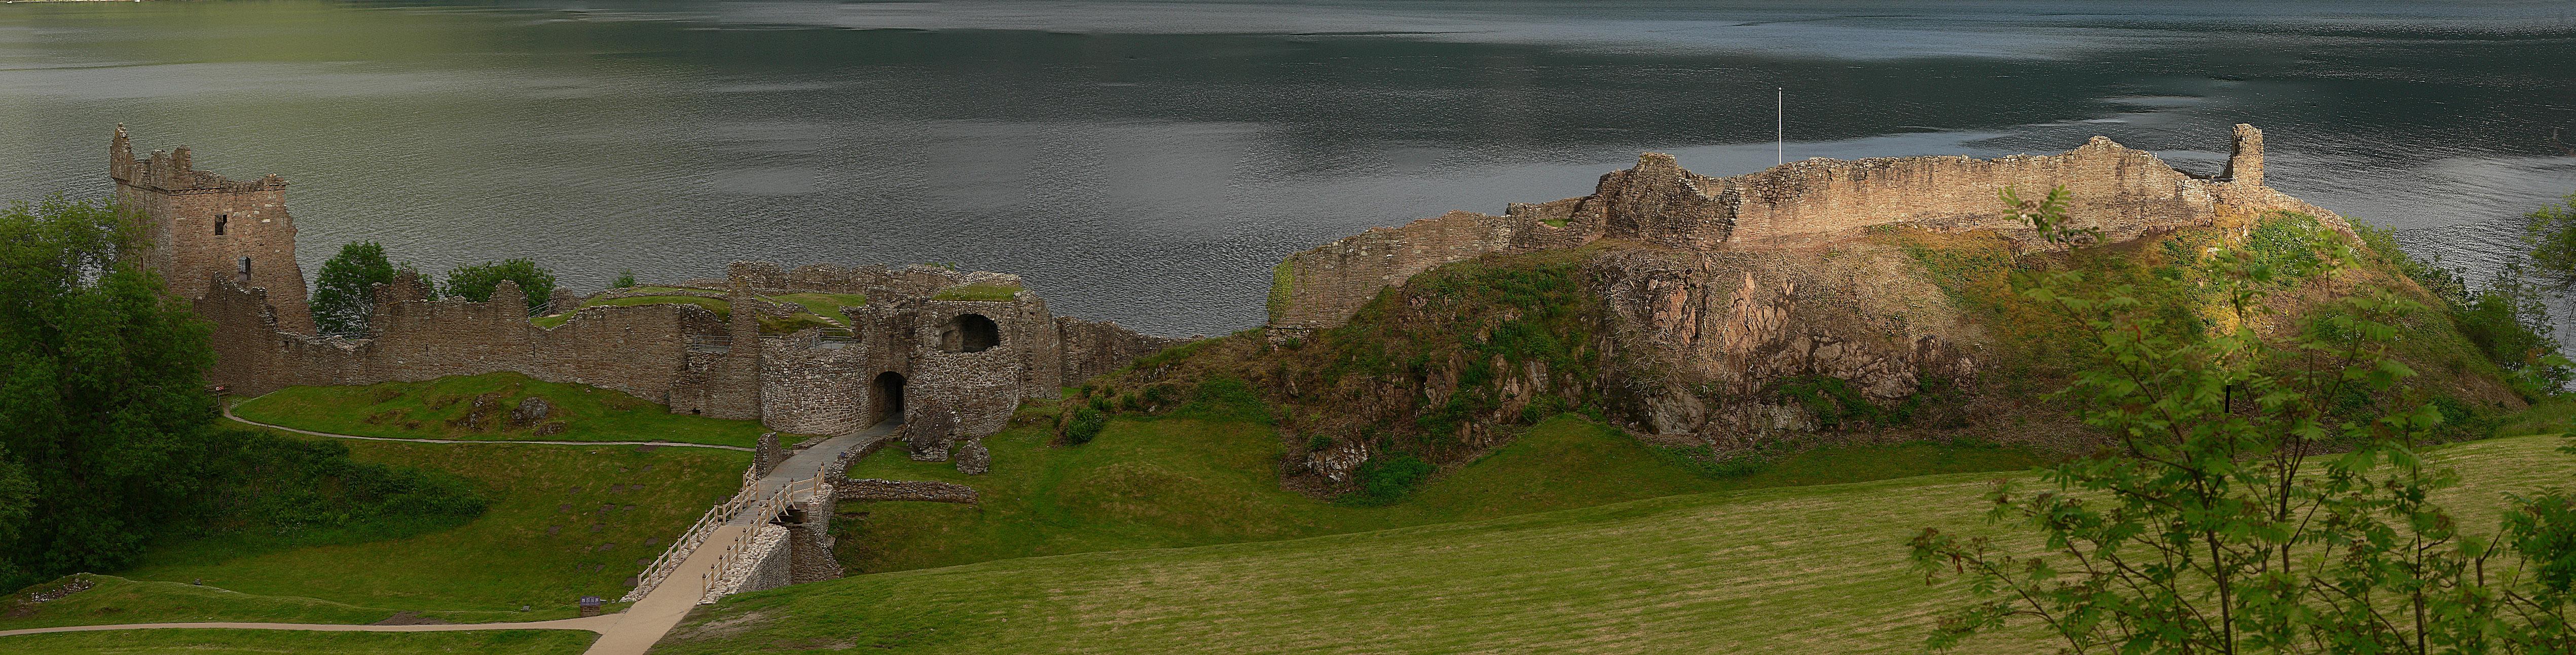 Urquhart Castle - Panorama 6.3-1460.JPG